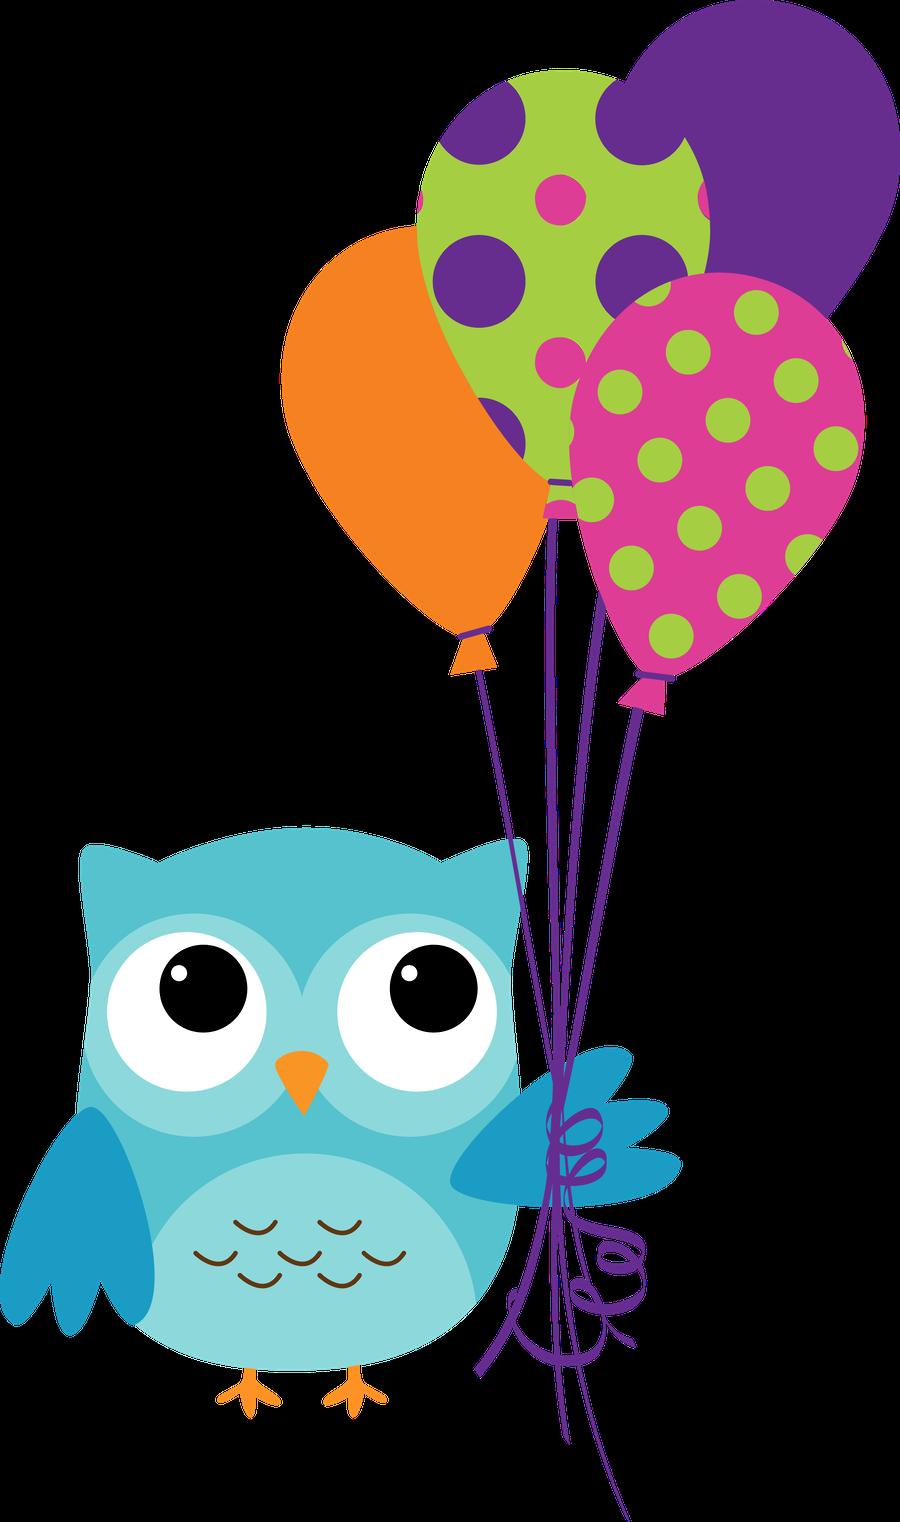 Happy cliparts free download. Owl clipart pencil